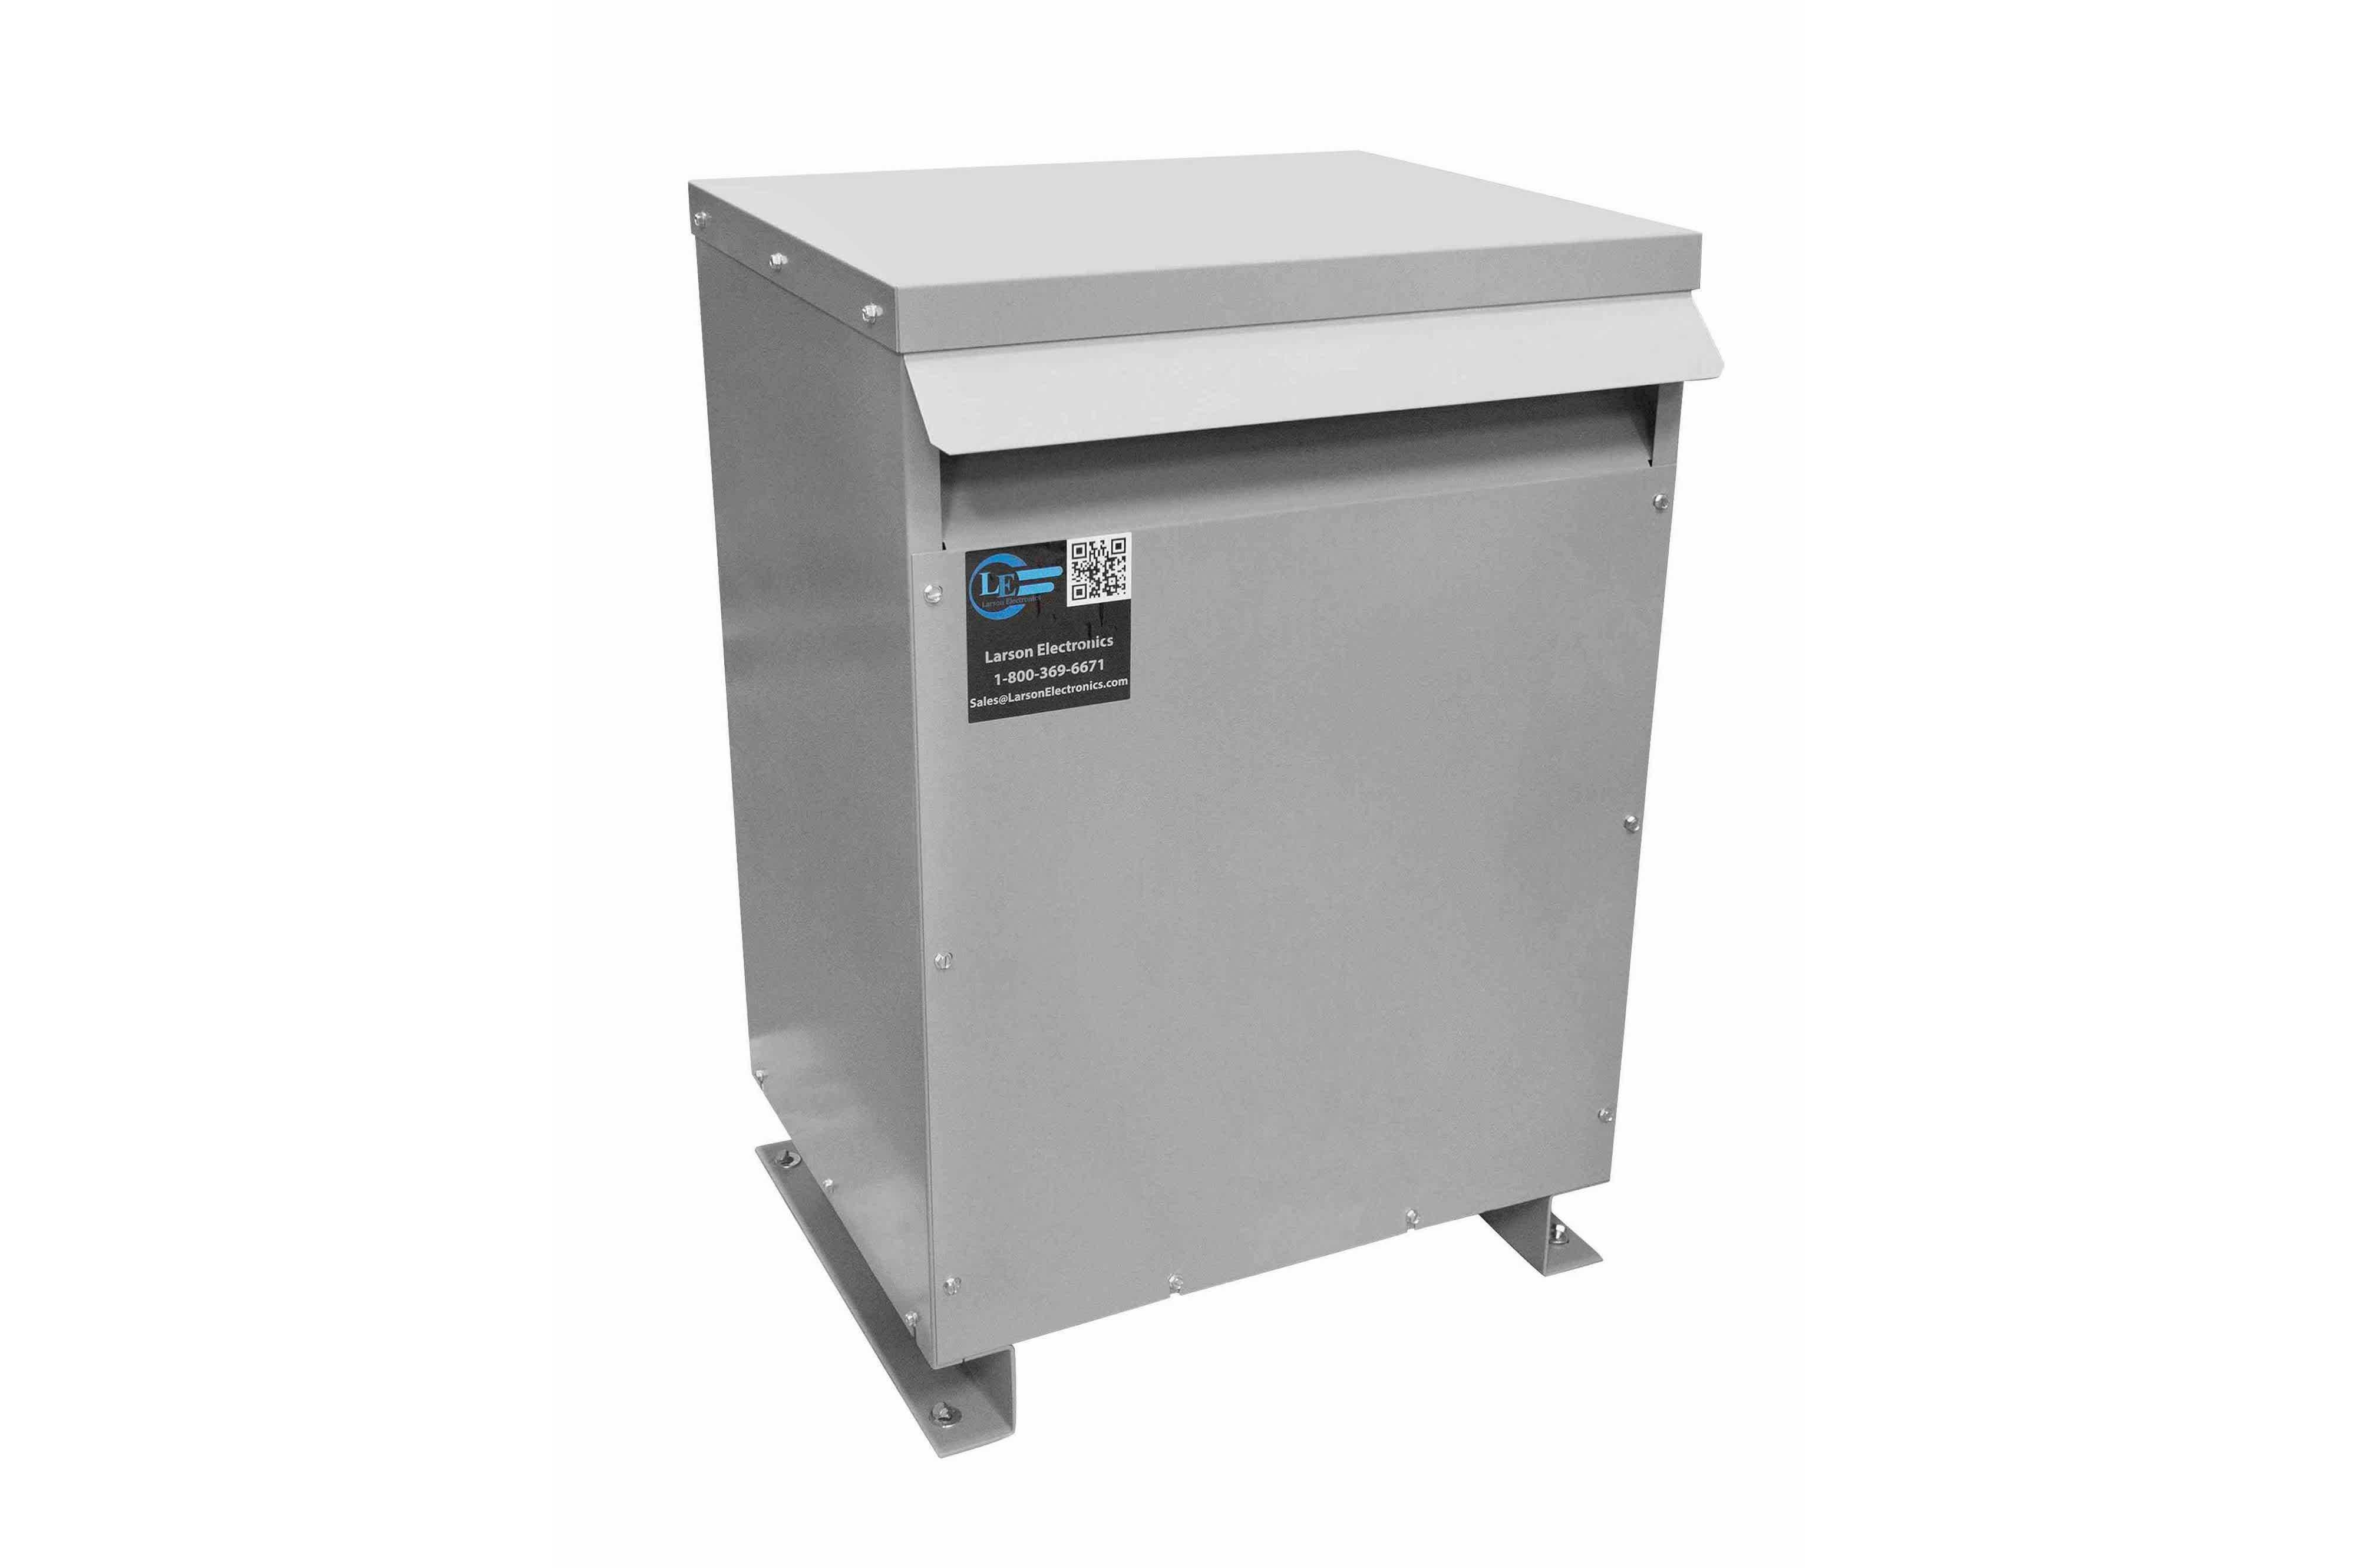 12 kVA 3PH DOE Transformer, 380V Delta Primary, 480Y/277 Wye-N Secondary, N3R, Ventilated, 60 Hz